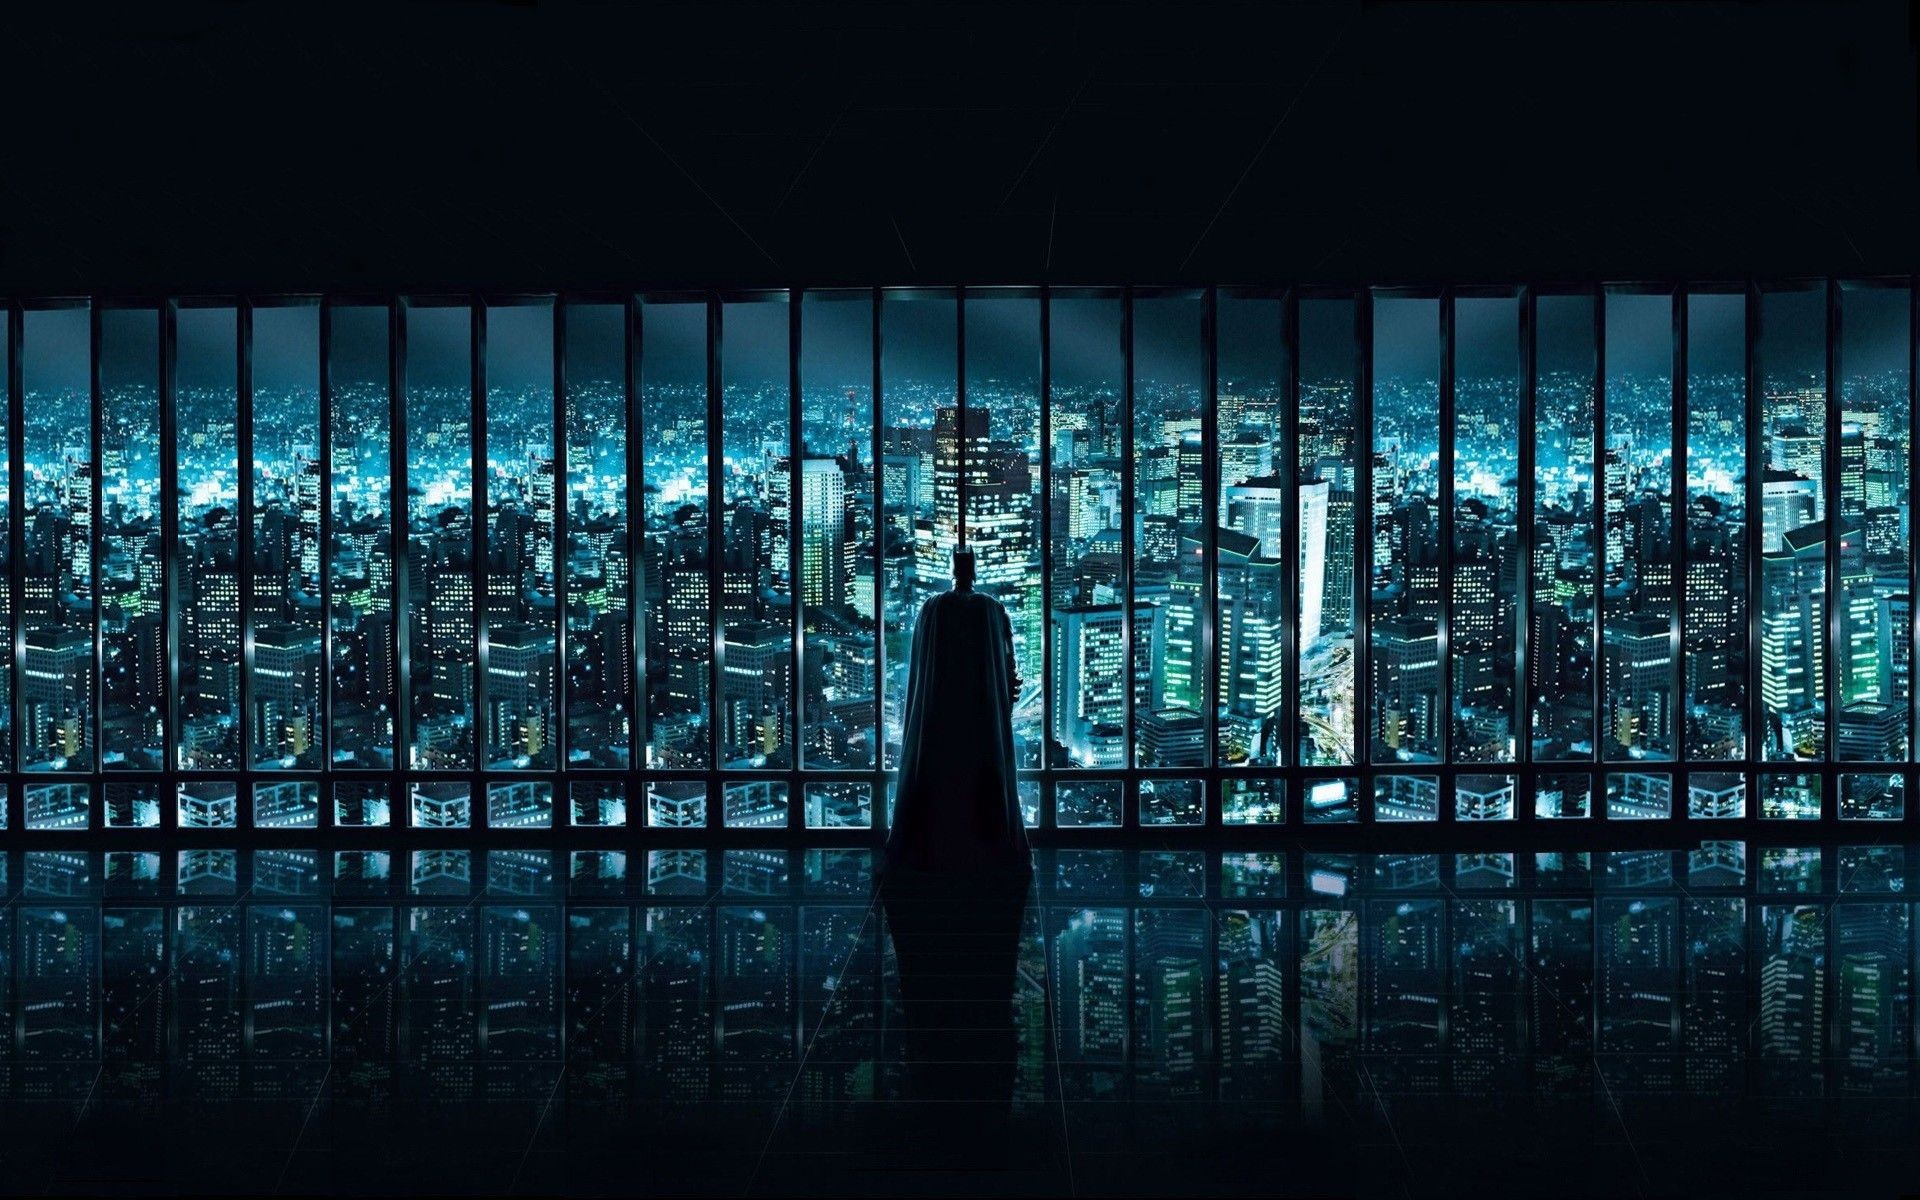 Batman Wallpaper Download Free Amazing Hd Wallpapers Of Batman